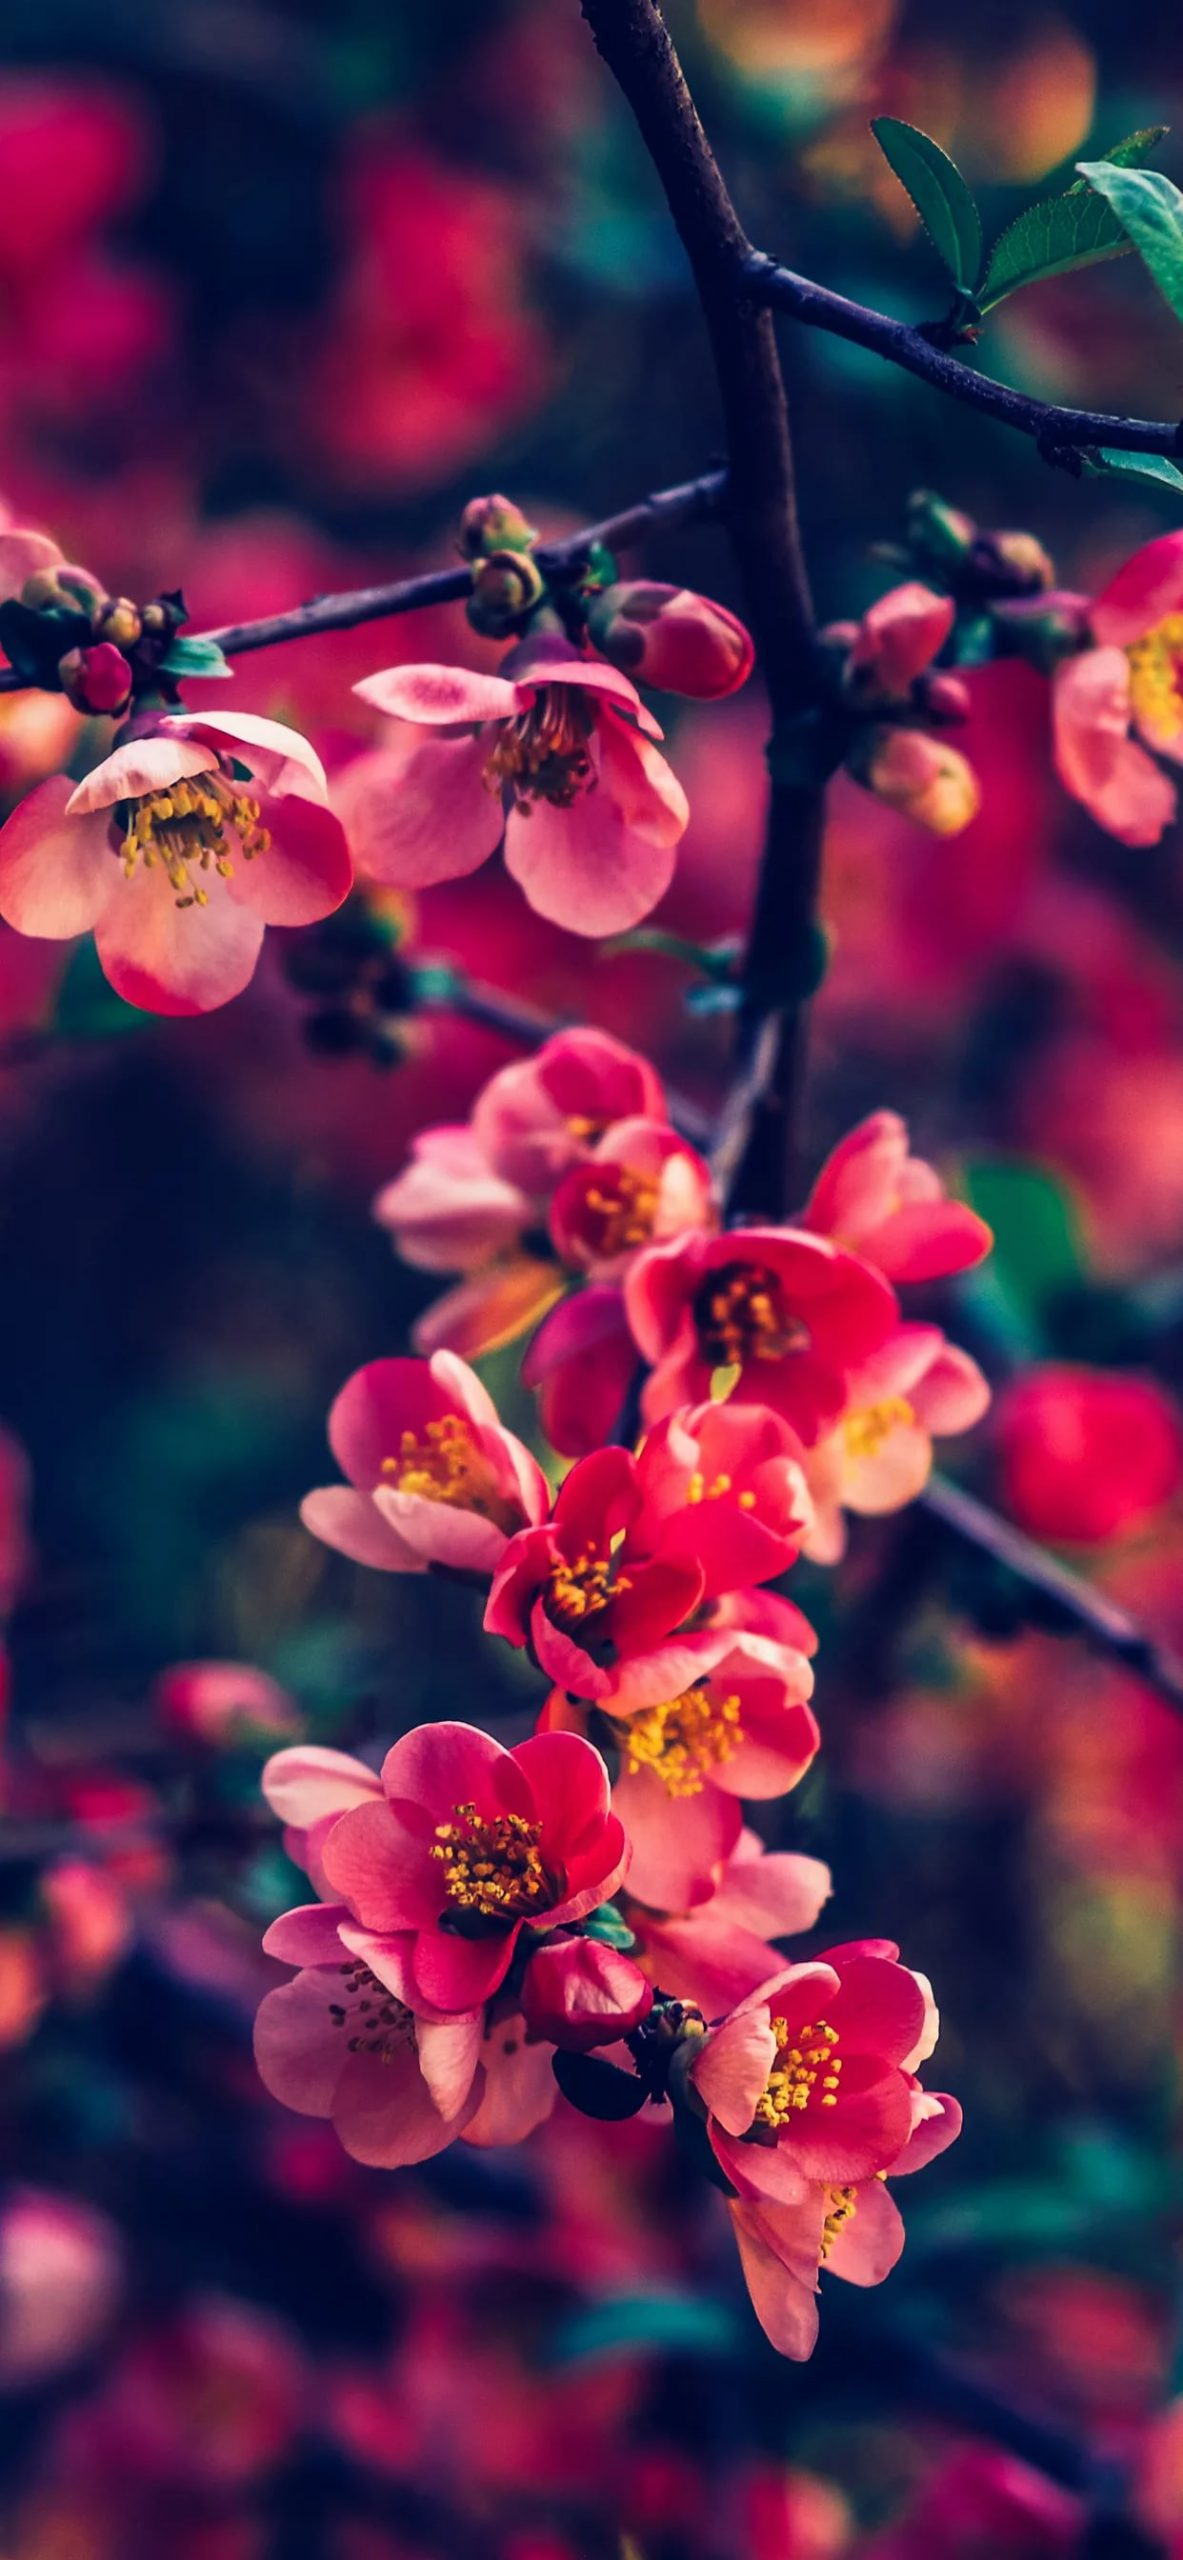 Красивые hd обои весна на телефон 1